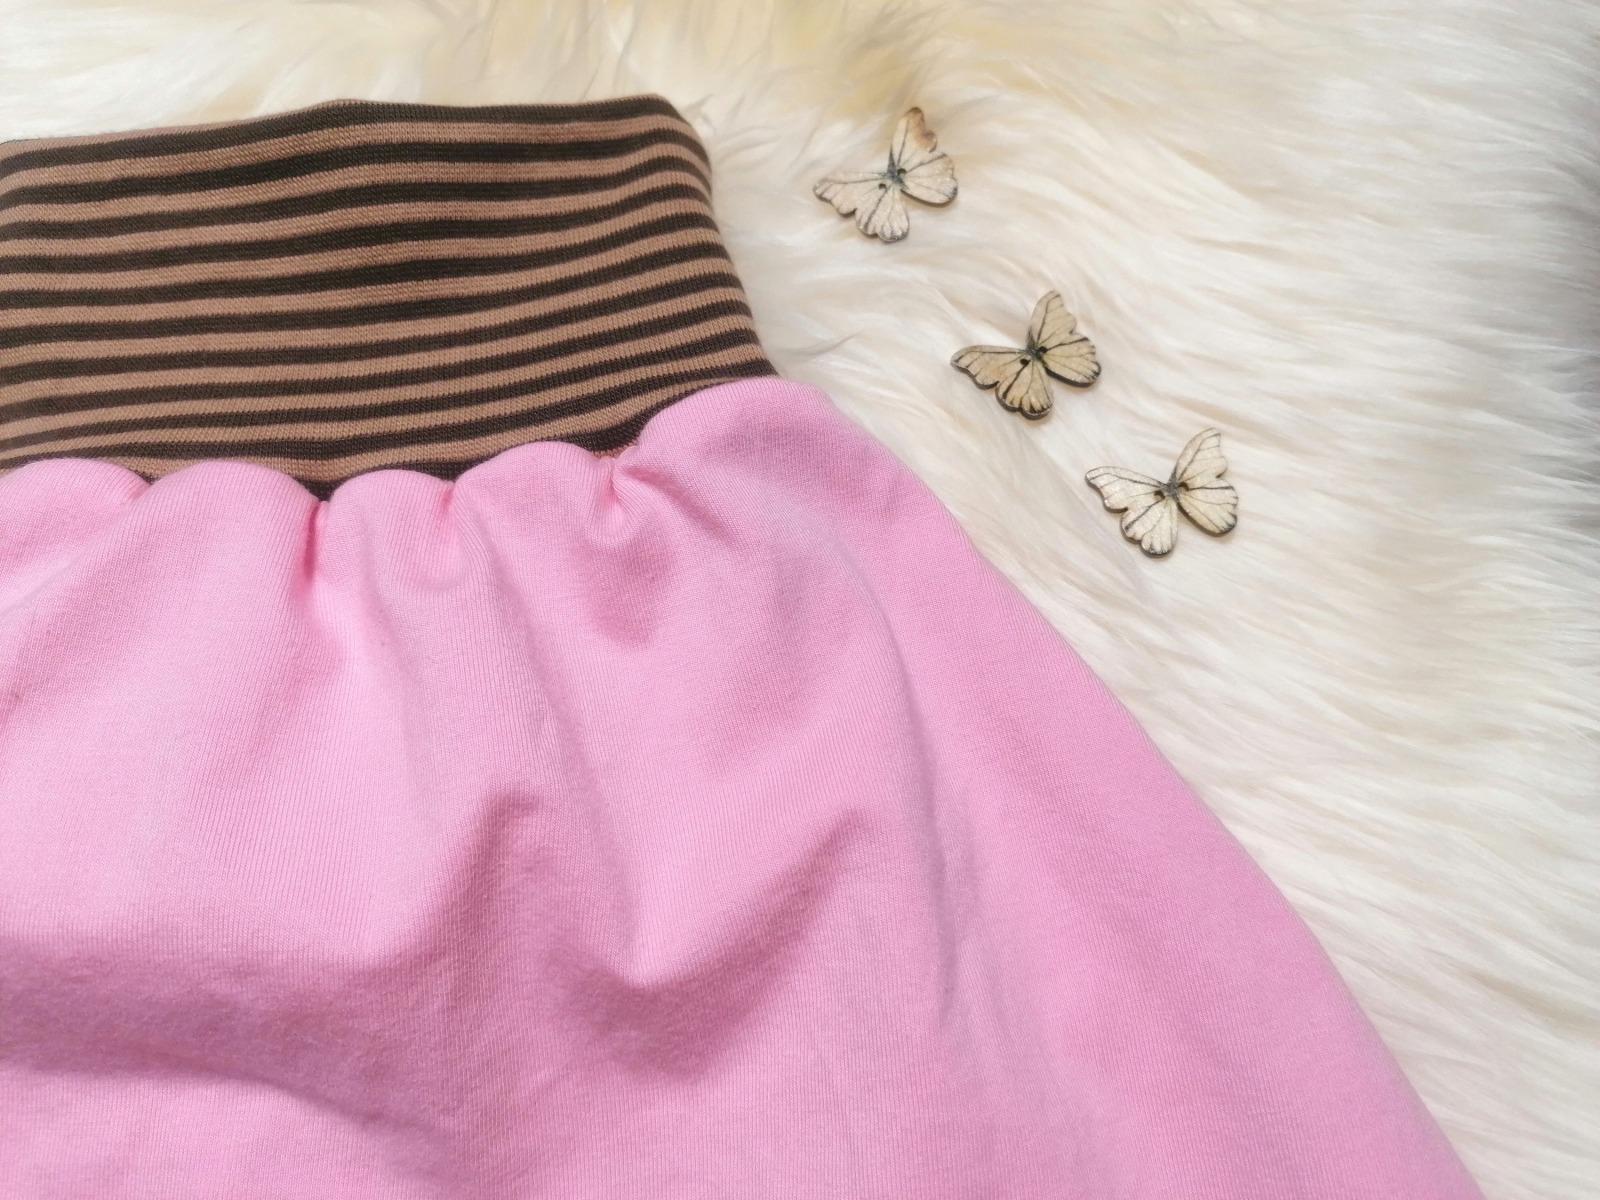 Pucksack Strampelsack Uni rosa in Größen